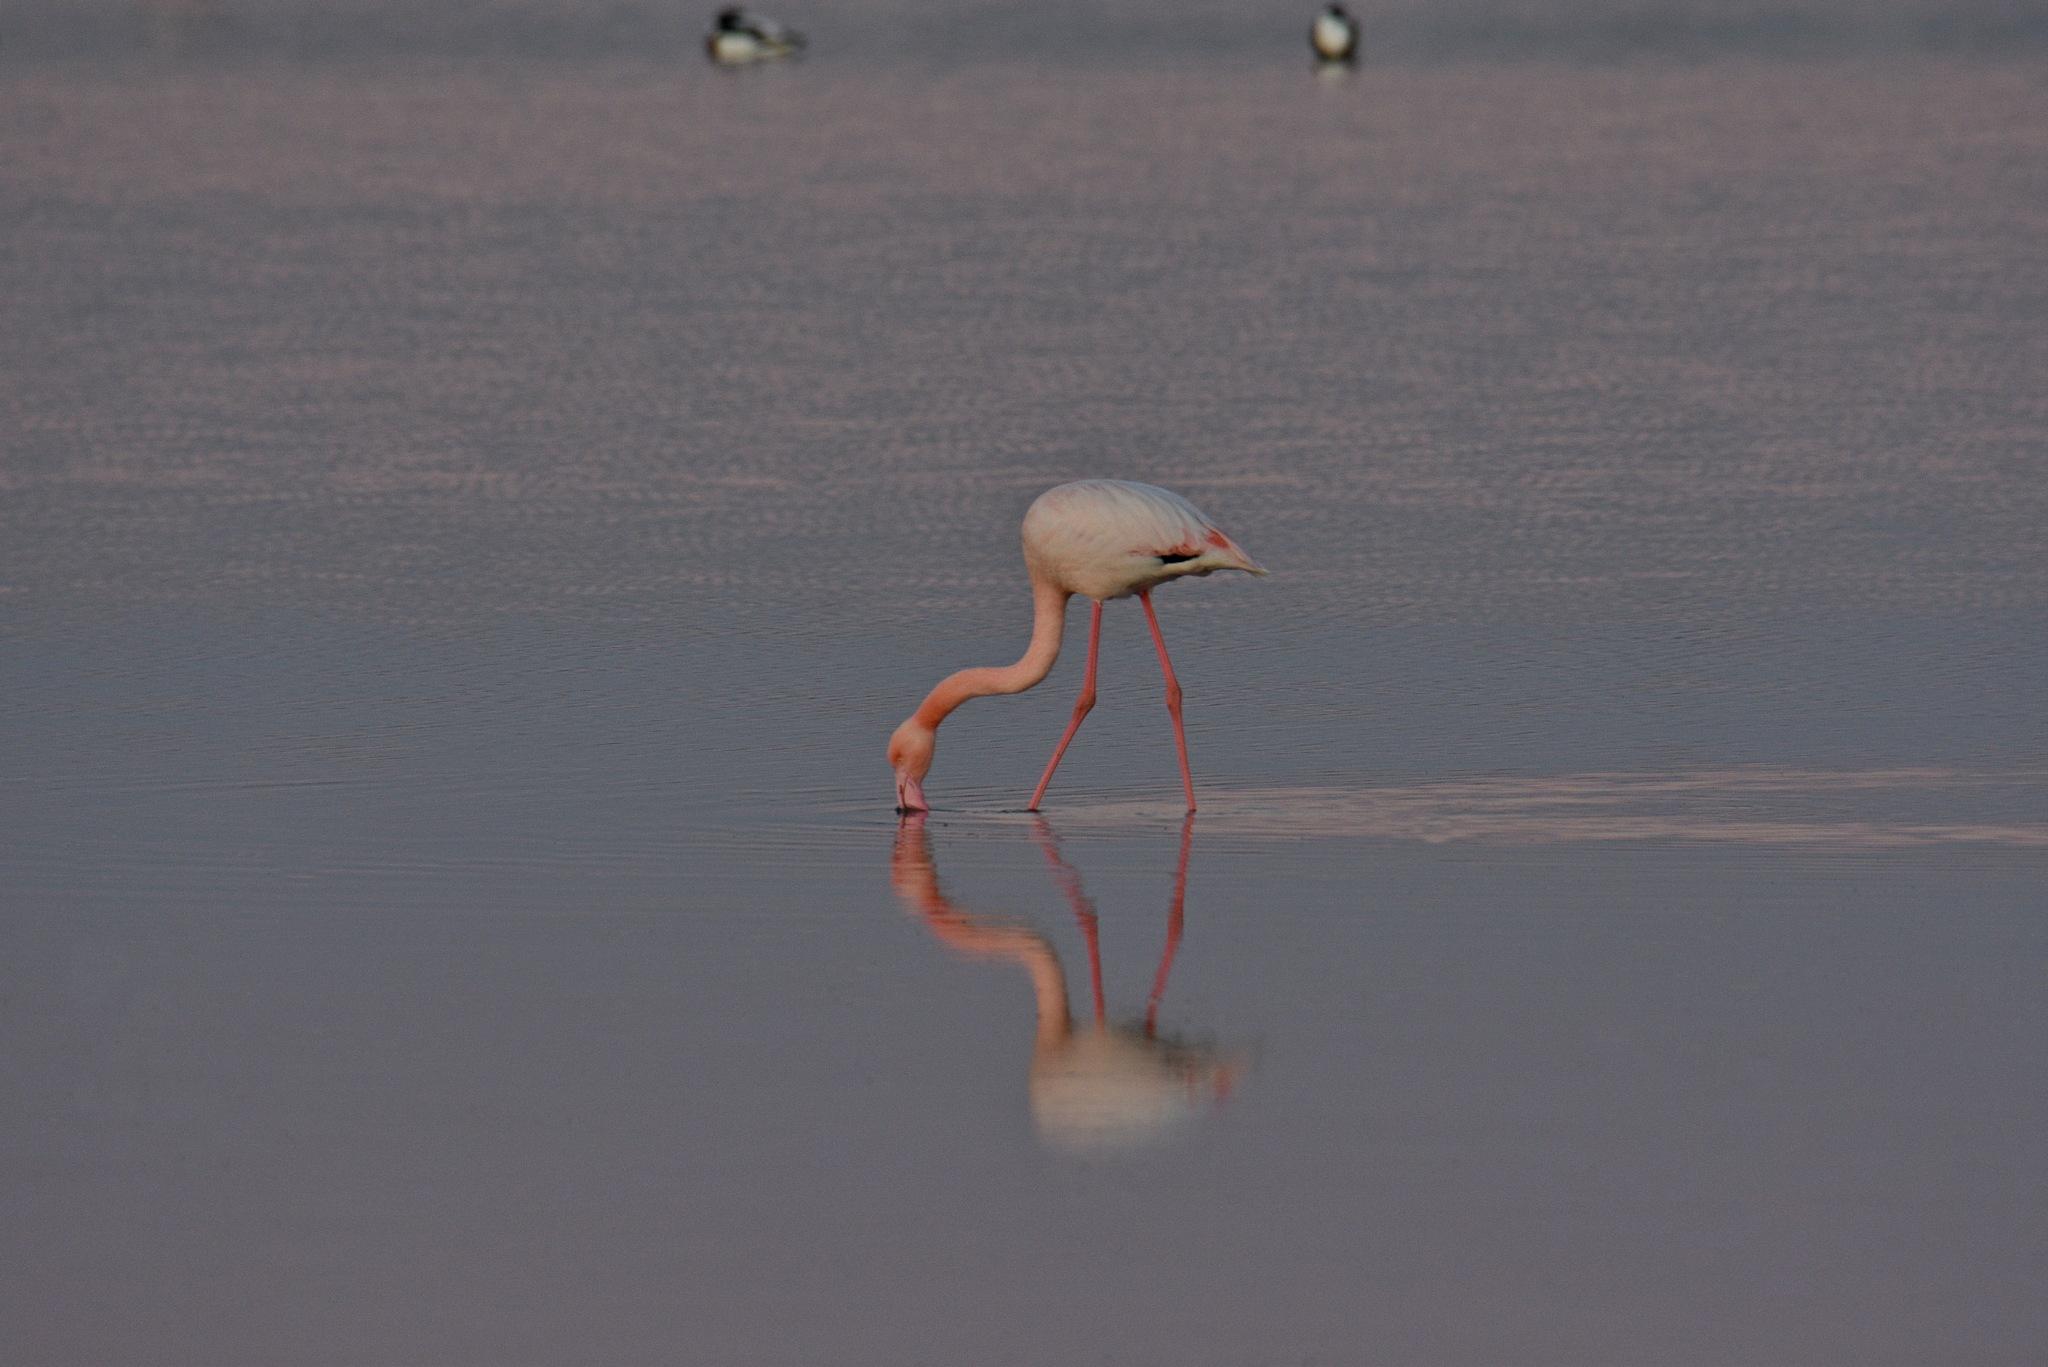 Flamingo by Nicola Nik Mazzini